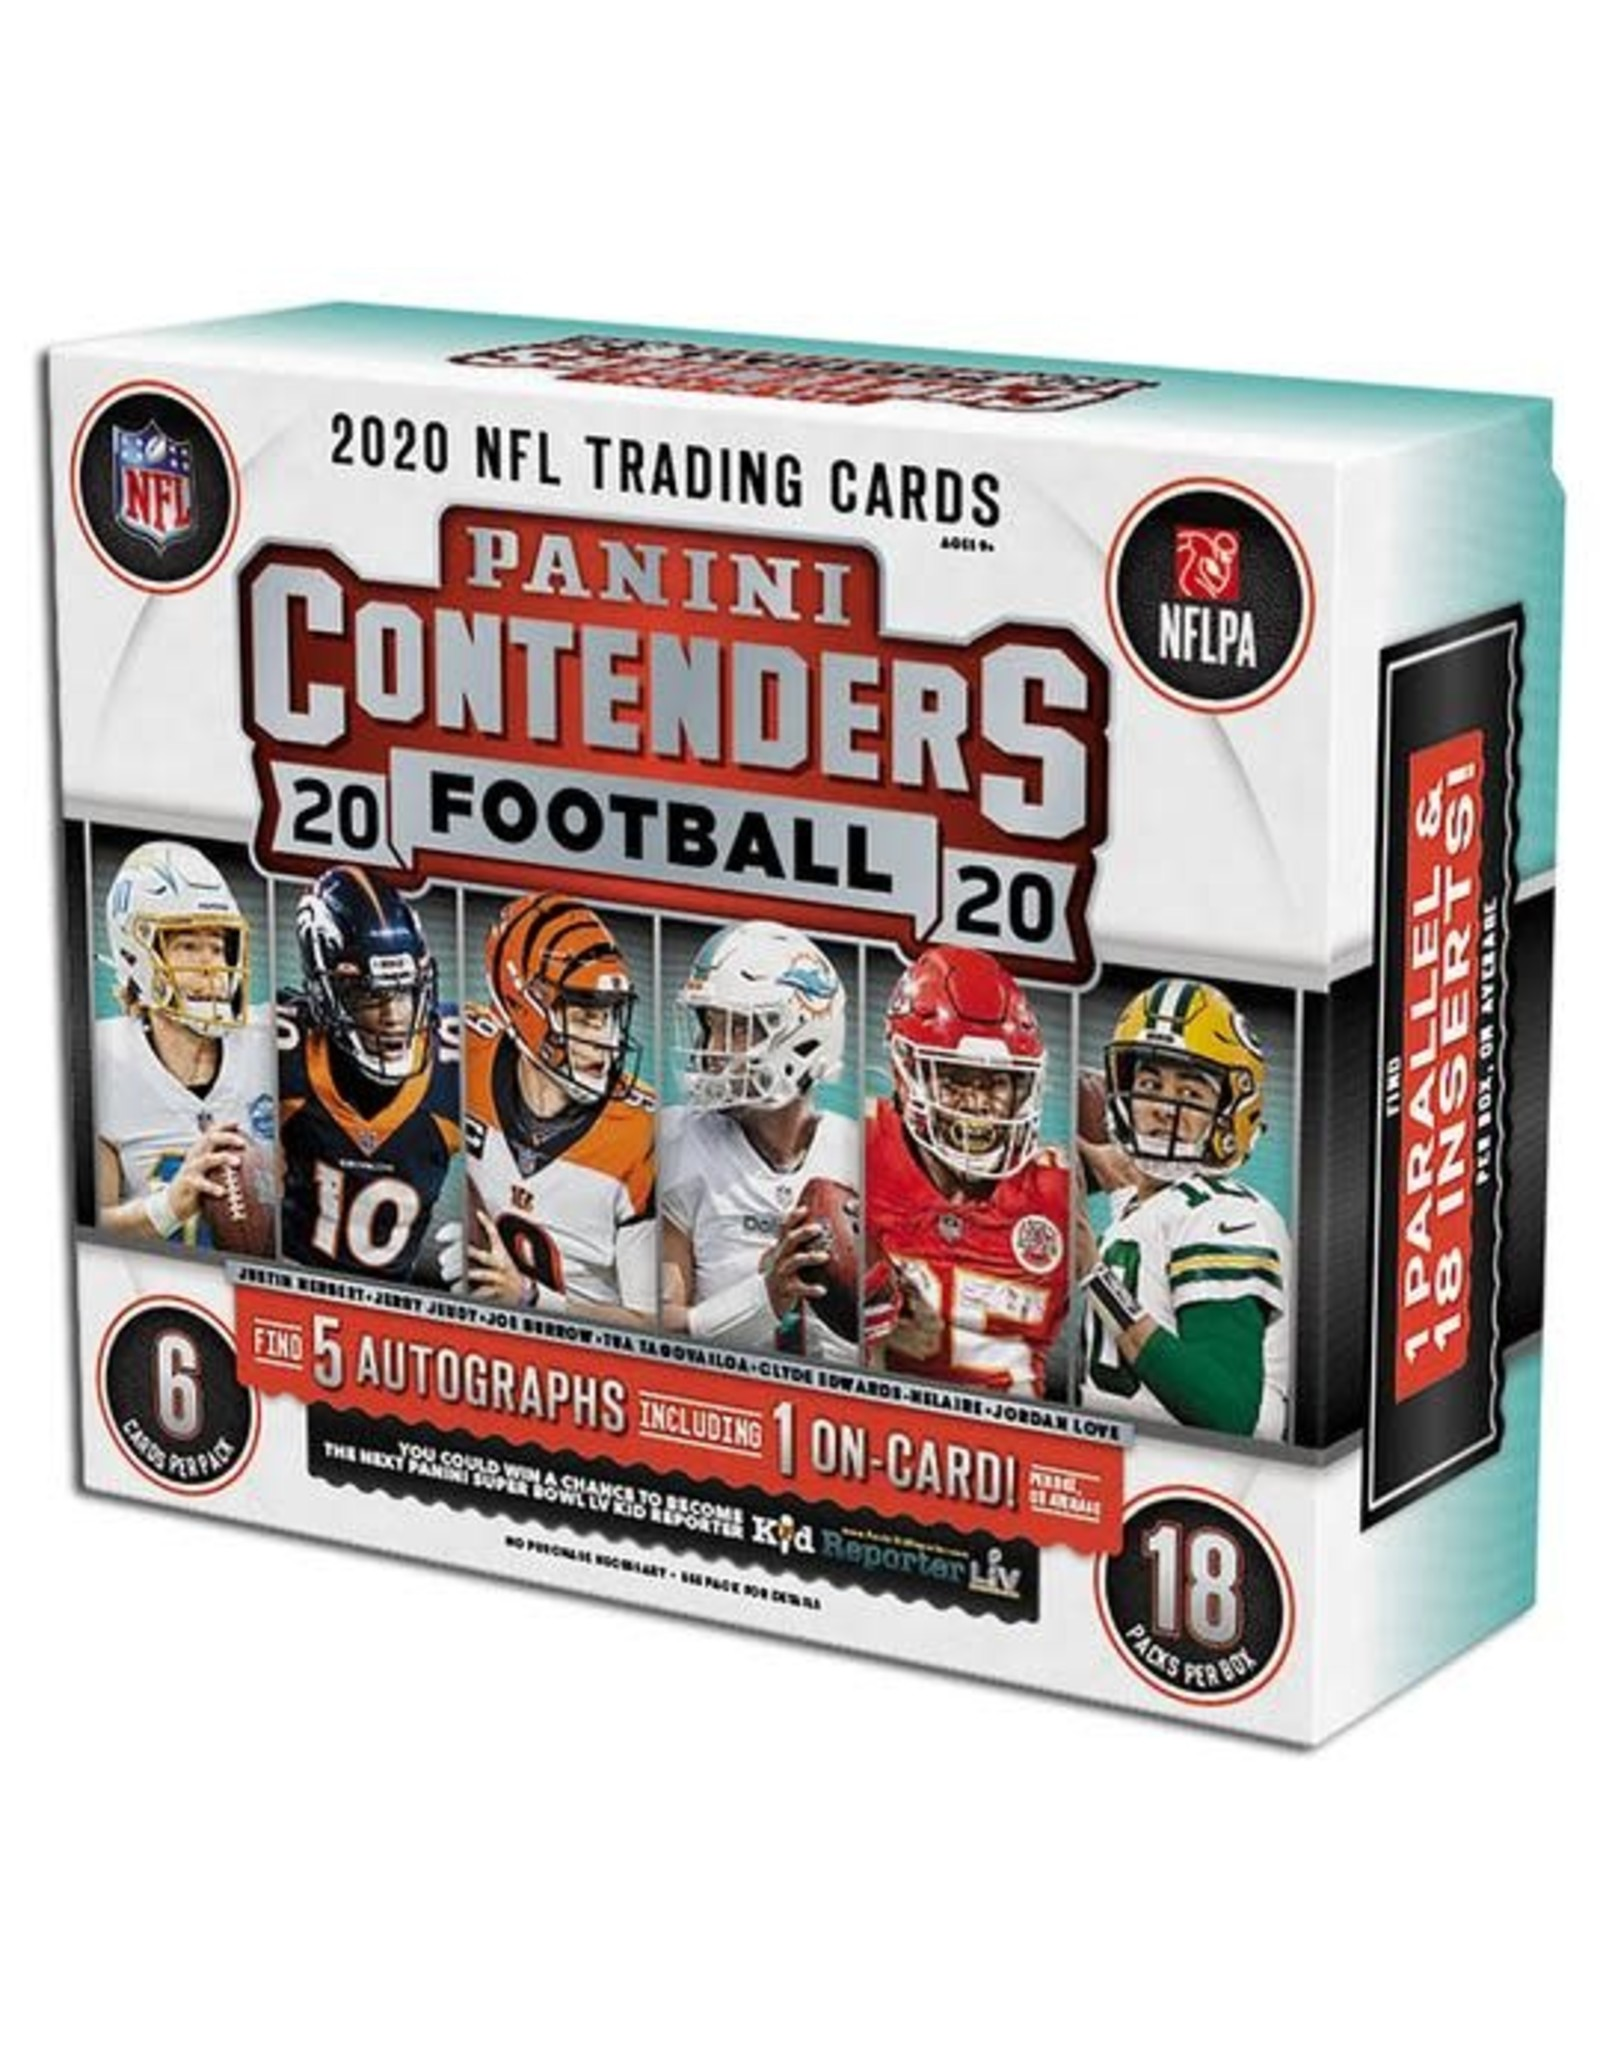 Panini 2020 Panini Contenders Football Hobby Box